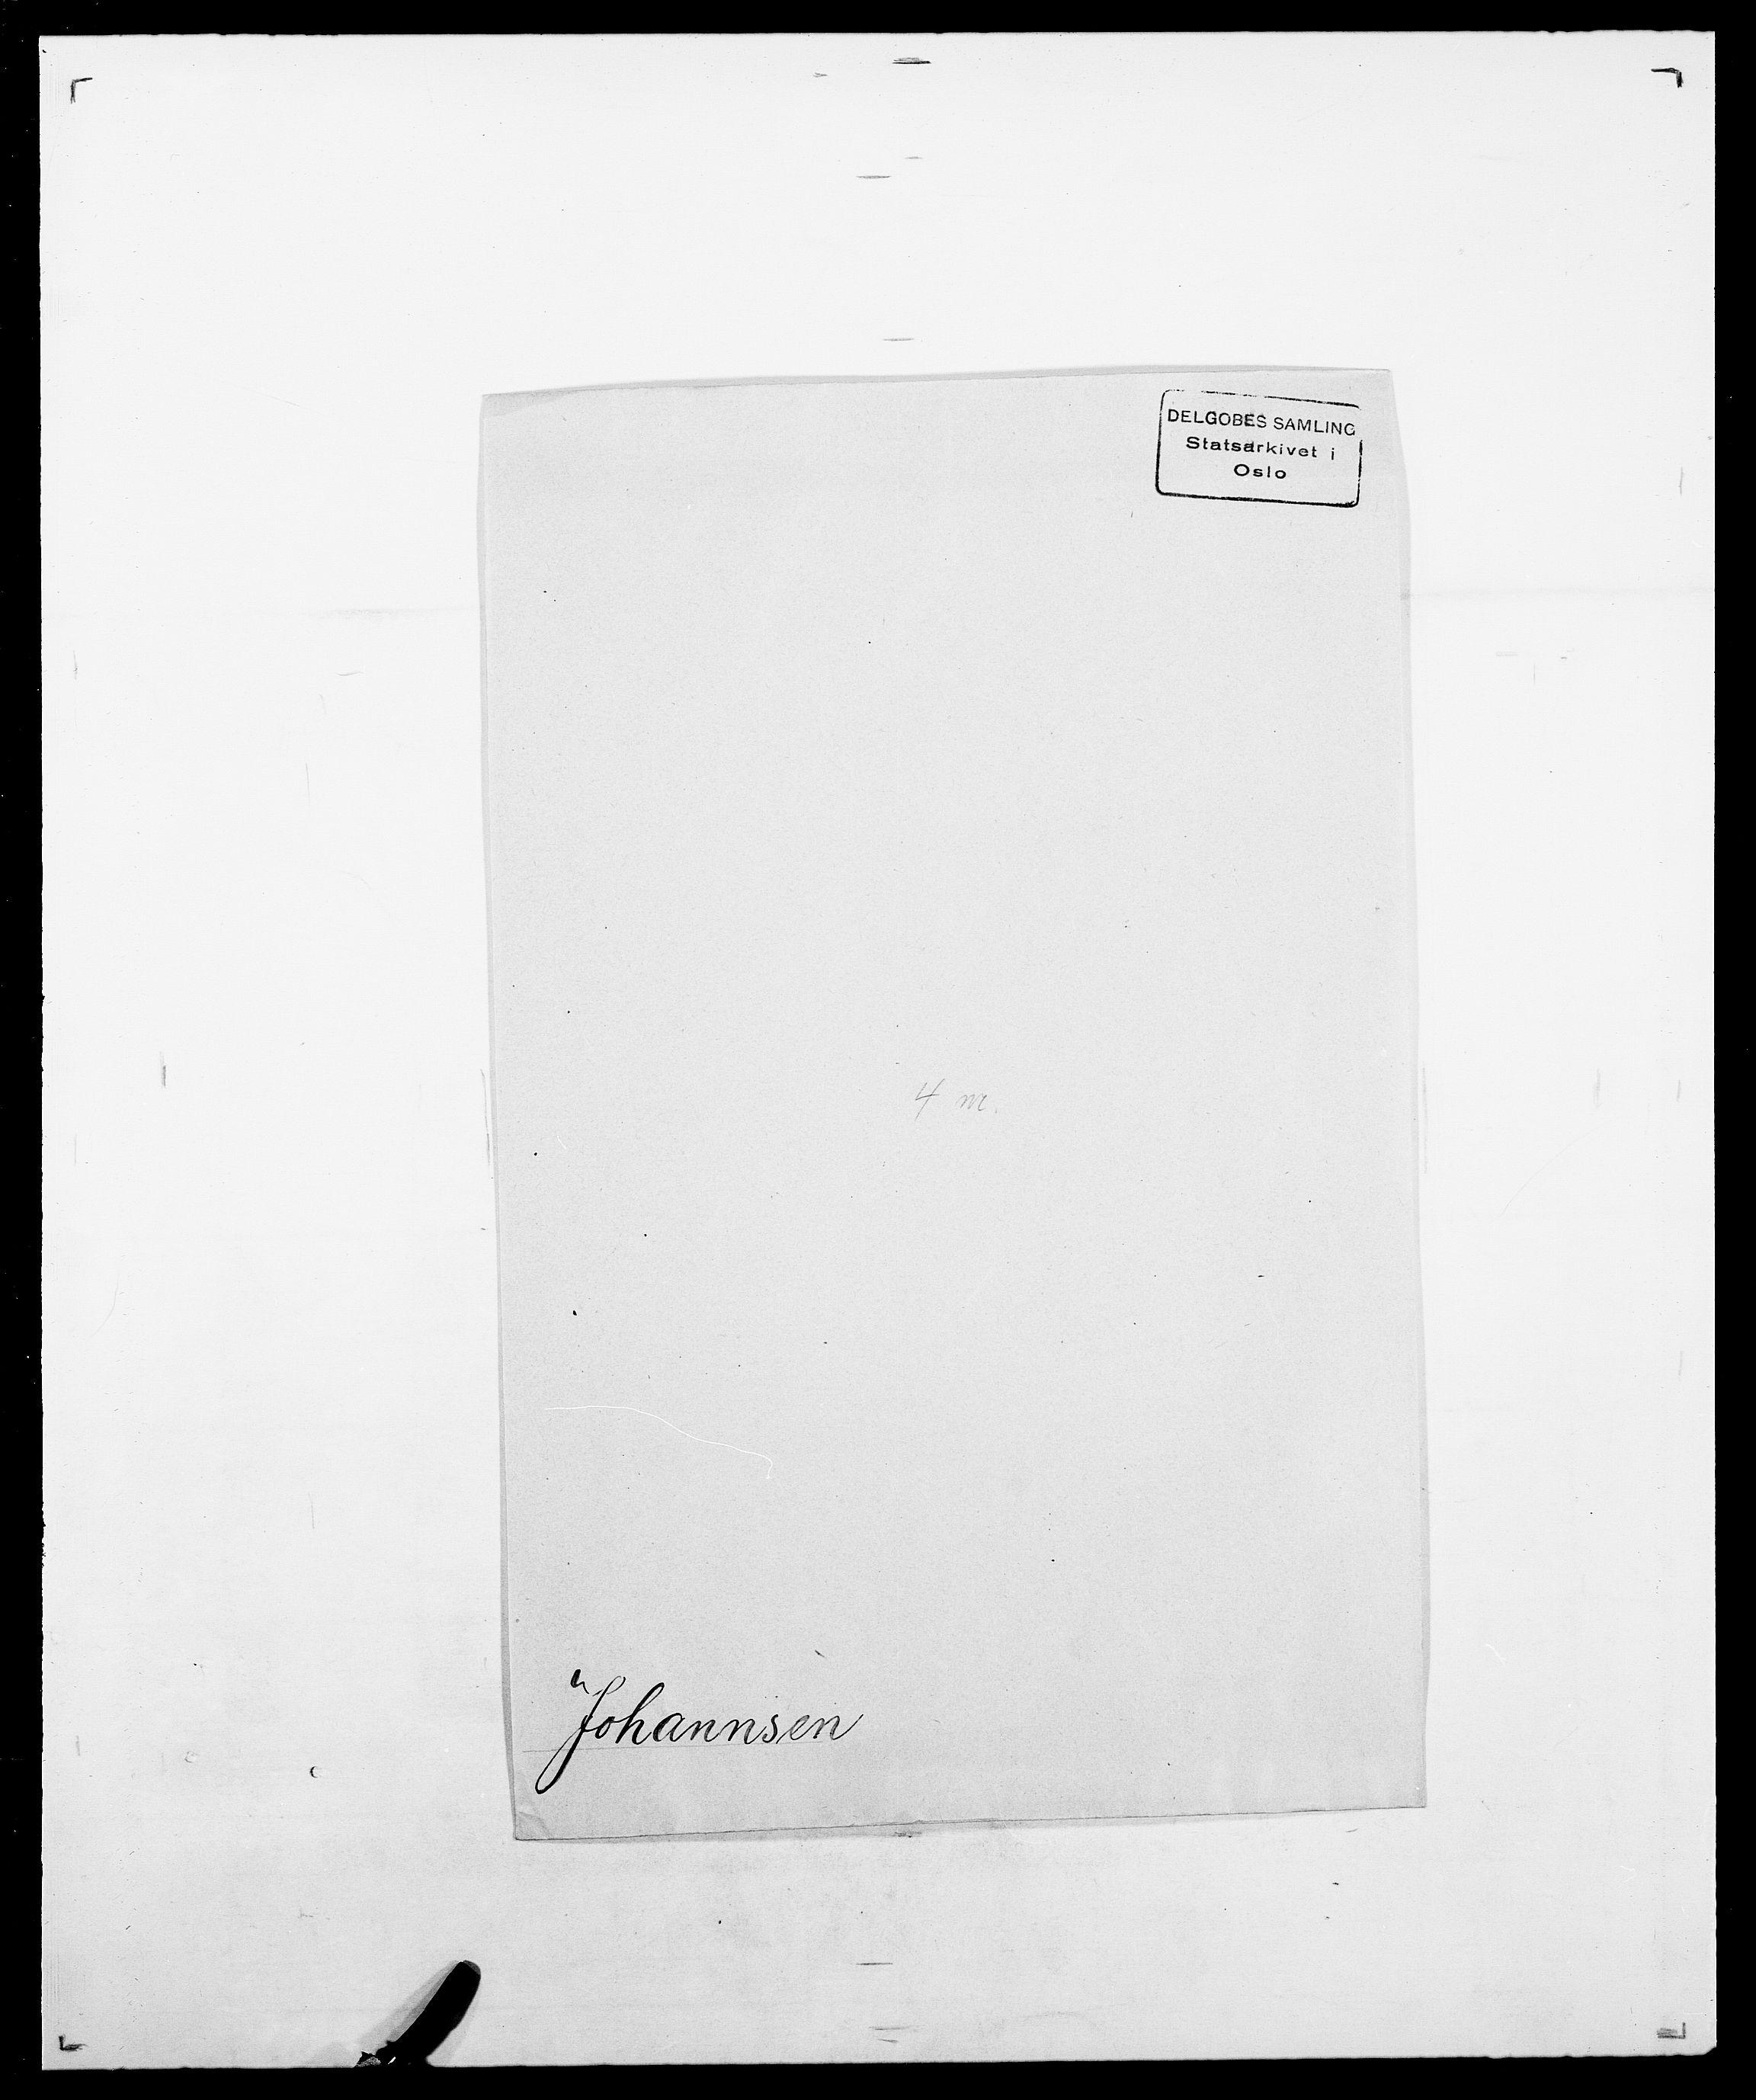 SAO, Delgobe, Charles Antoine - samling, D/Da/L0019: van der Hude - Joys, s. 823